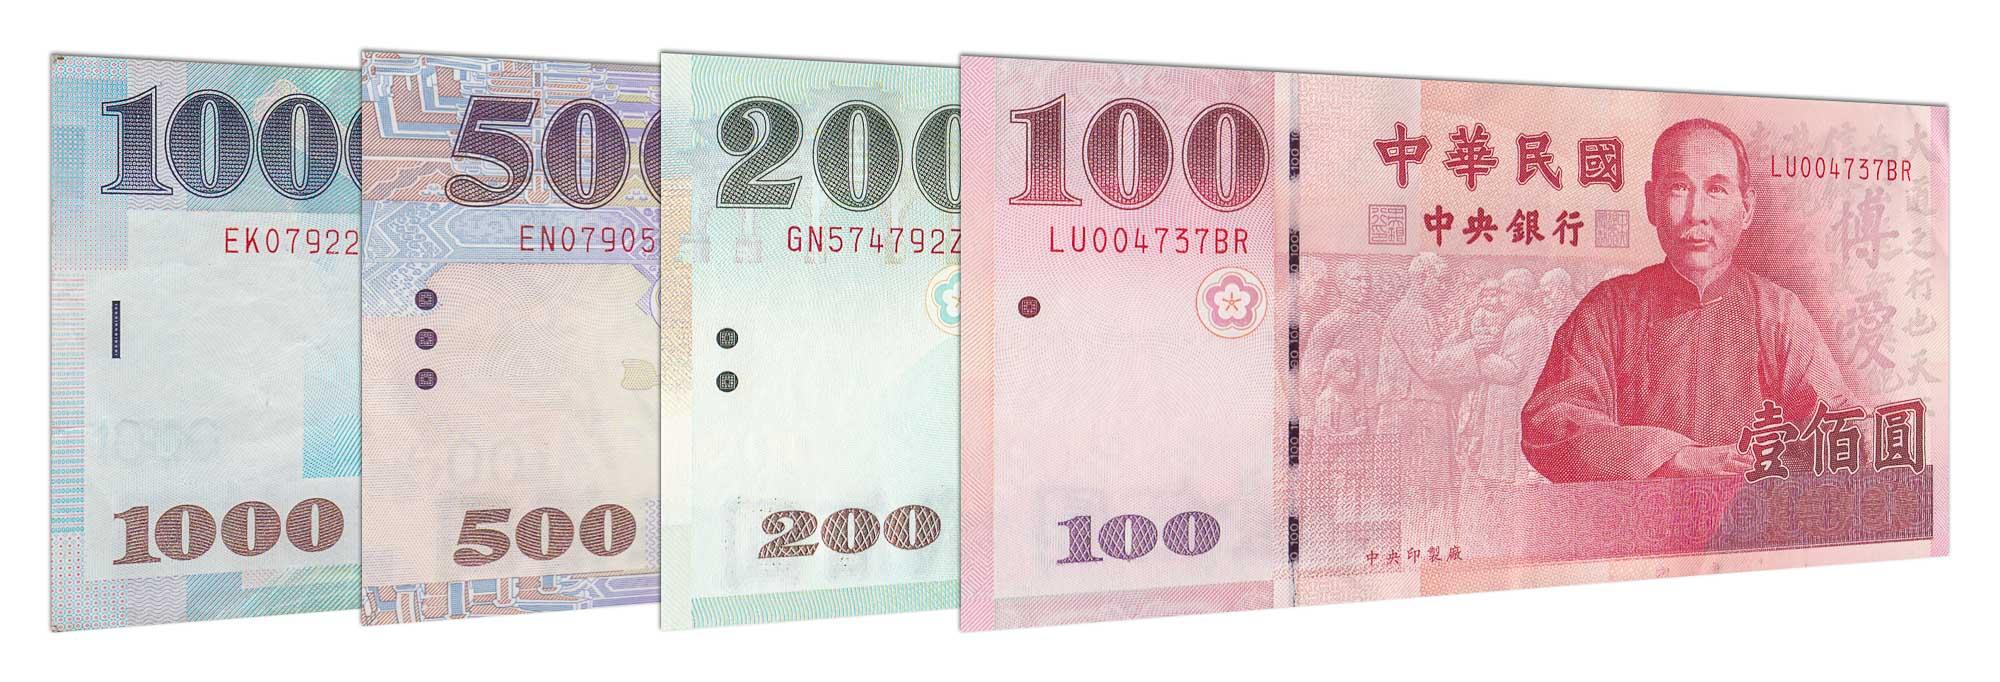 New Taiwan Dollars Online Twd